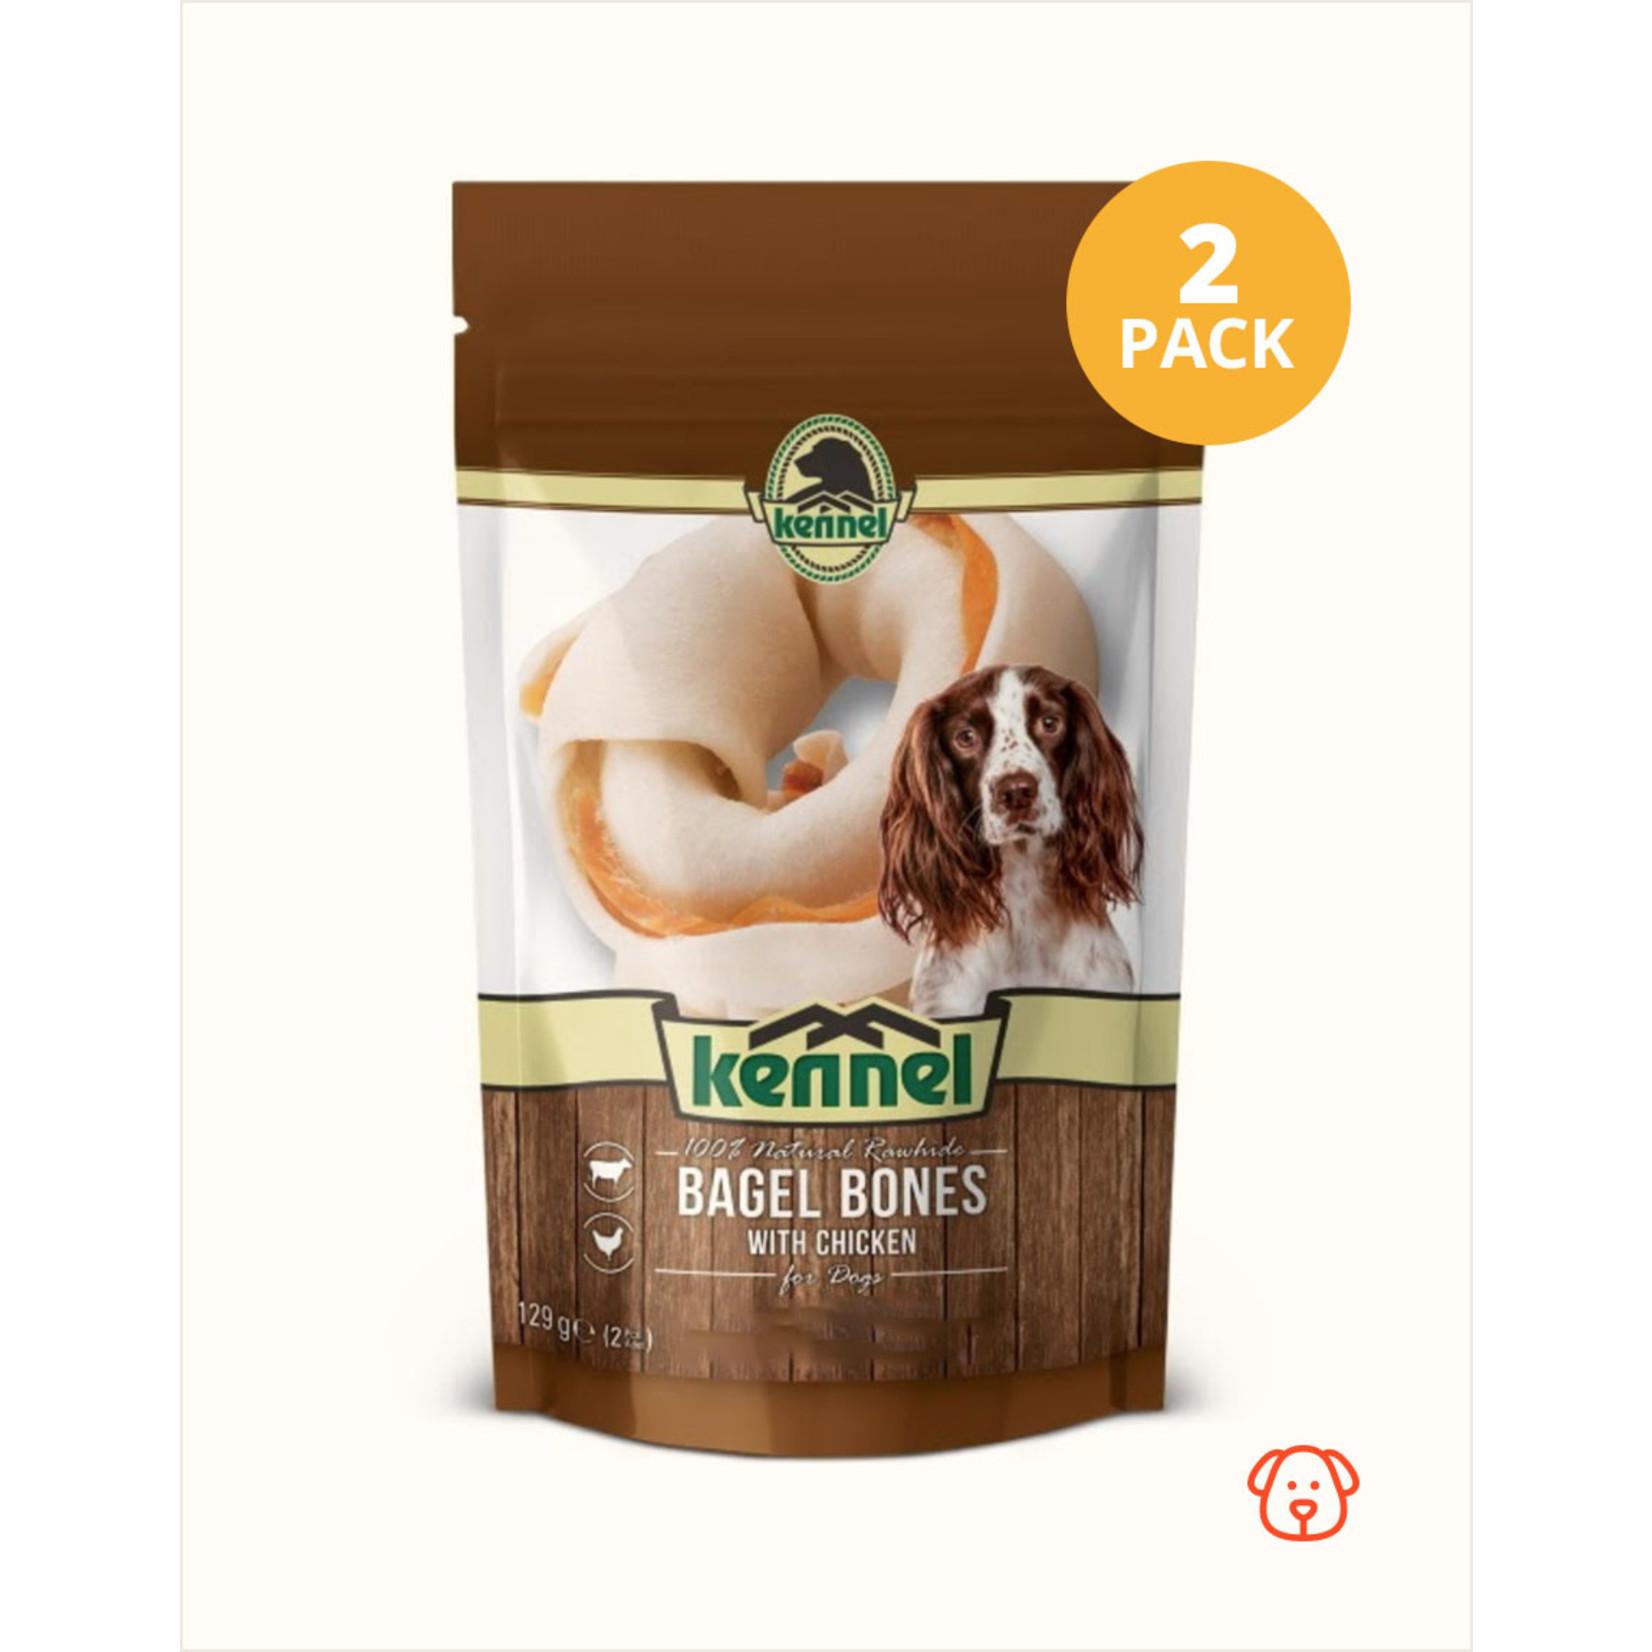 Kennel Kennel Chewing Bagel Bones   2 Pack